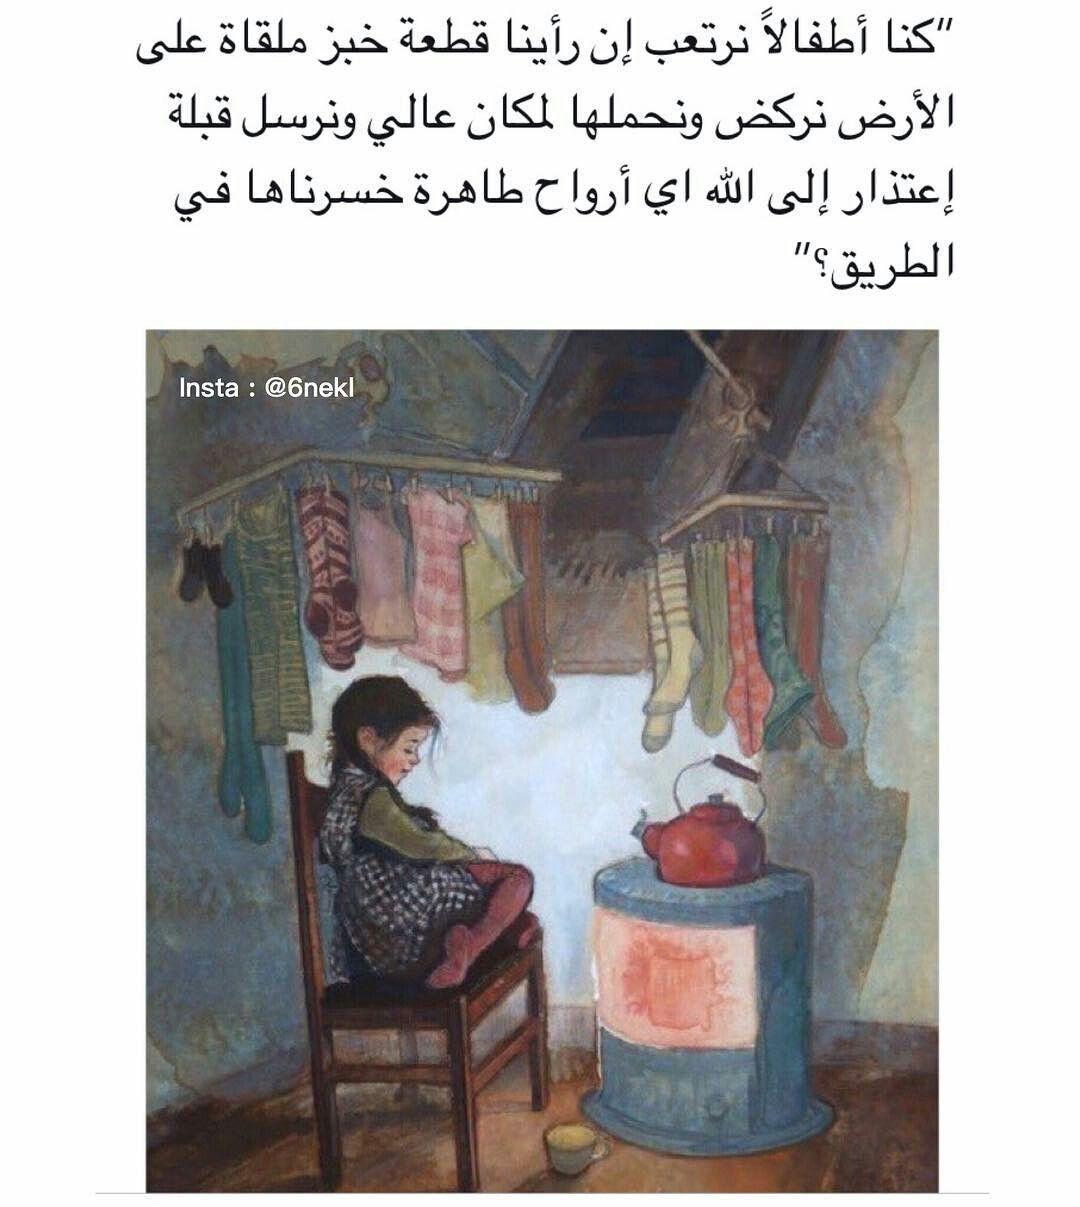 مااجمل الطفولة Arabic Quotes Circle Quotes Words Quotes